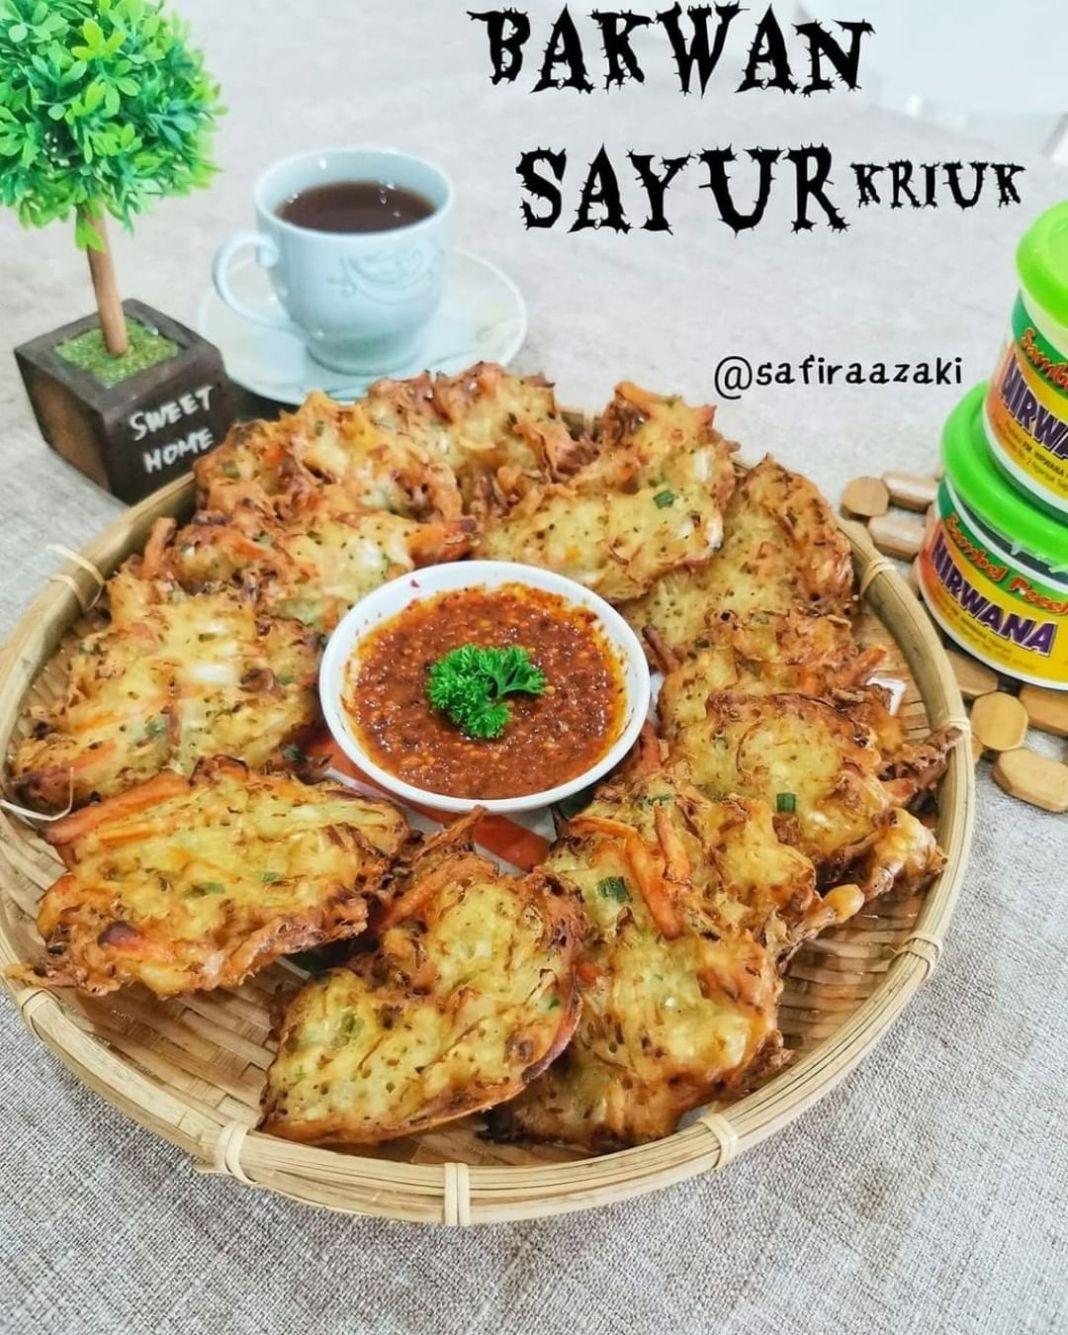 Info kuliner, Bakwan Sayur Kriuk By @safiraazaki  enak bangett.. Wajib coba pasti ketagihan   Bahan2 : 250 gr…